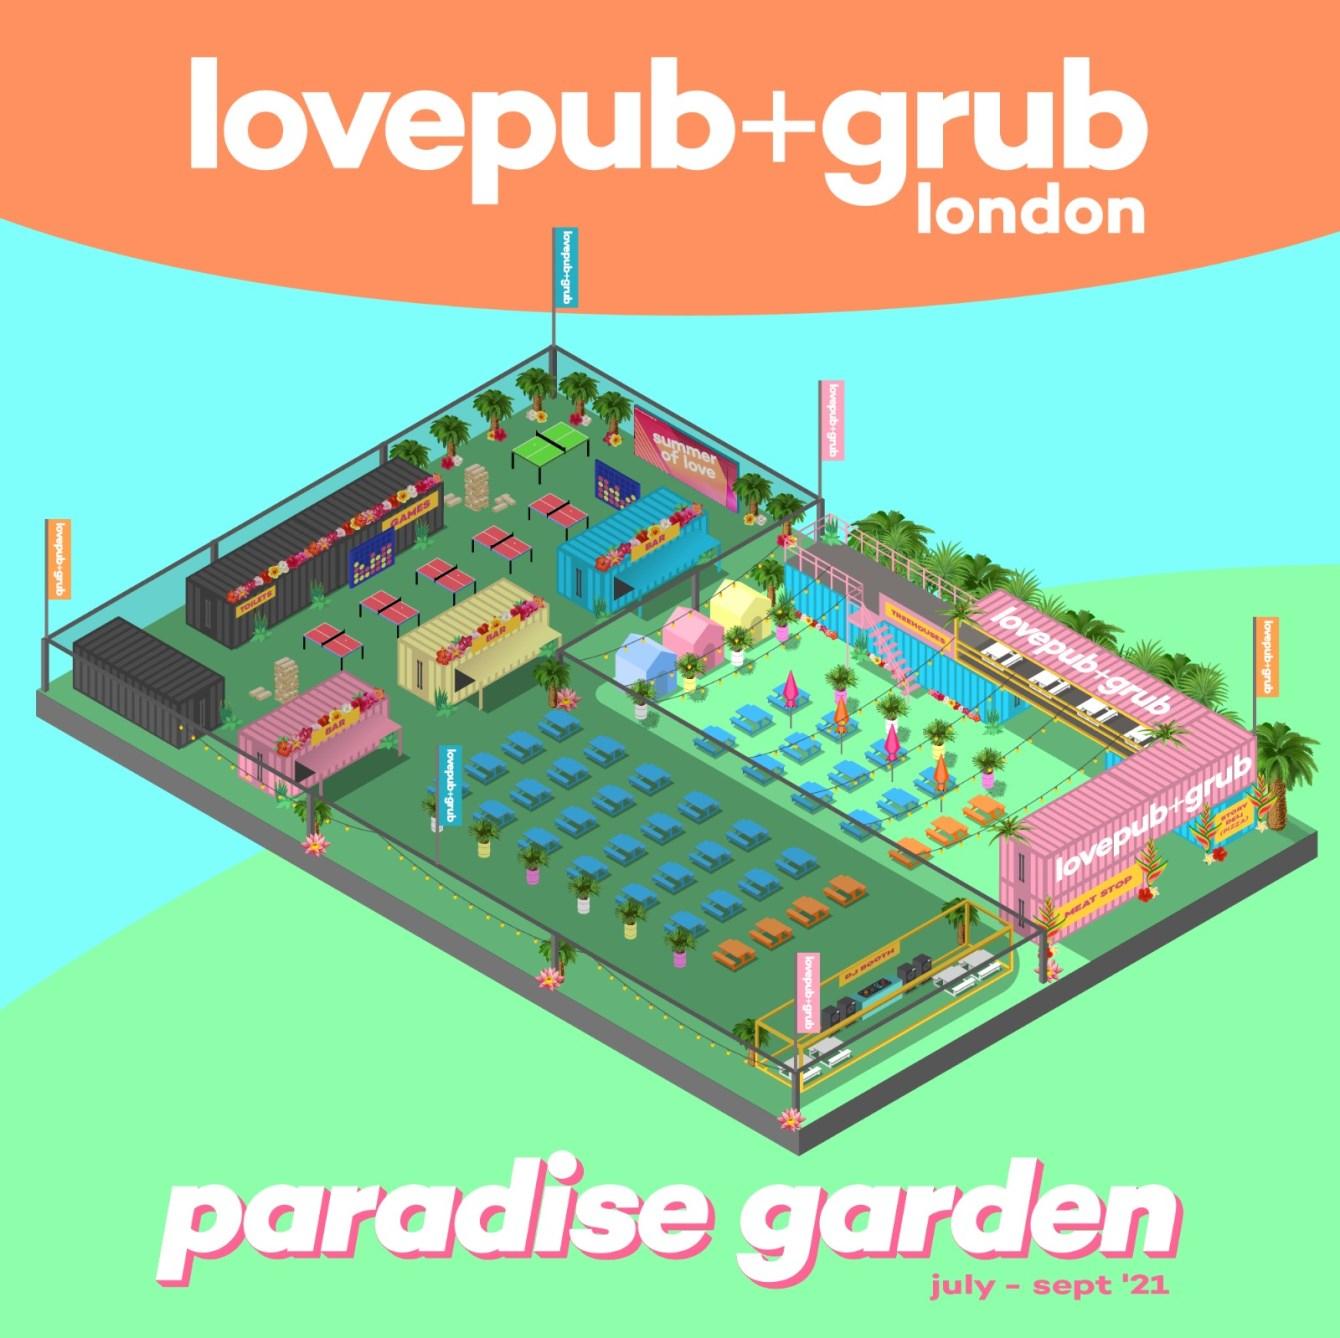 Love Pub & Grub - Sat 24 July - Flyer back